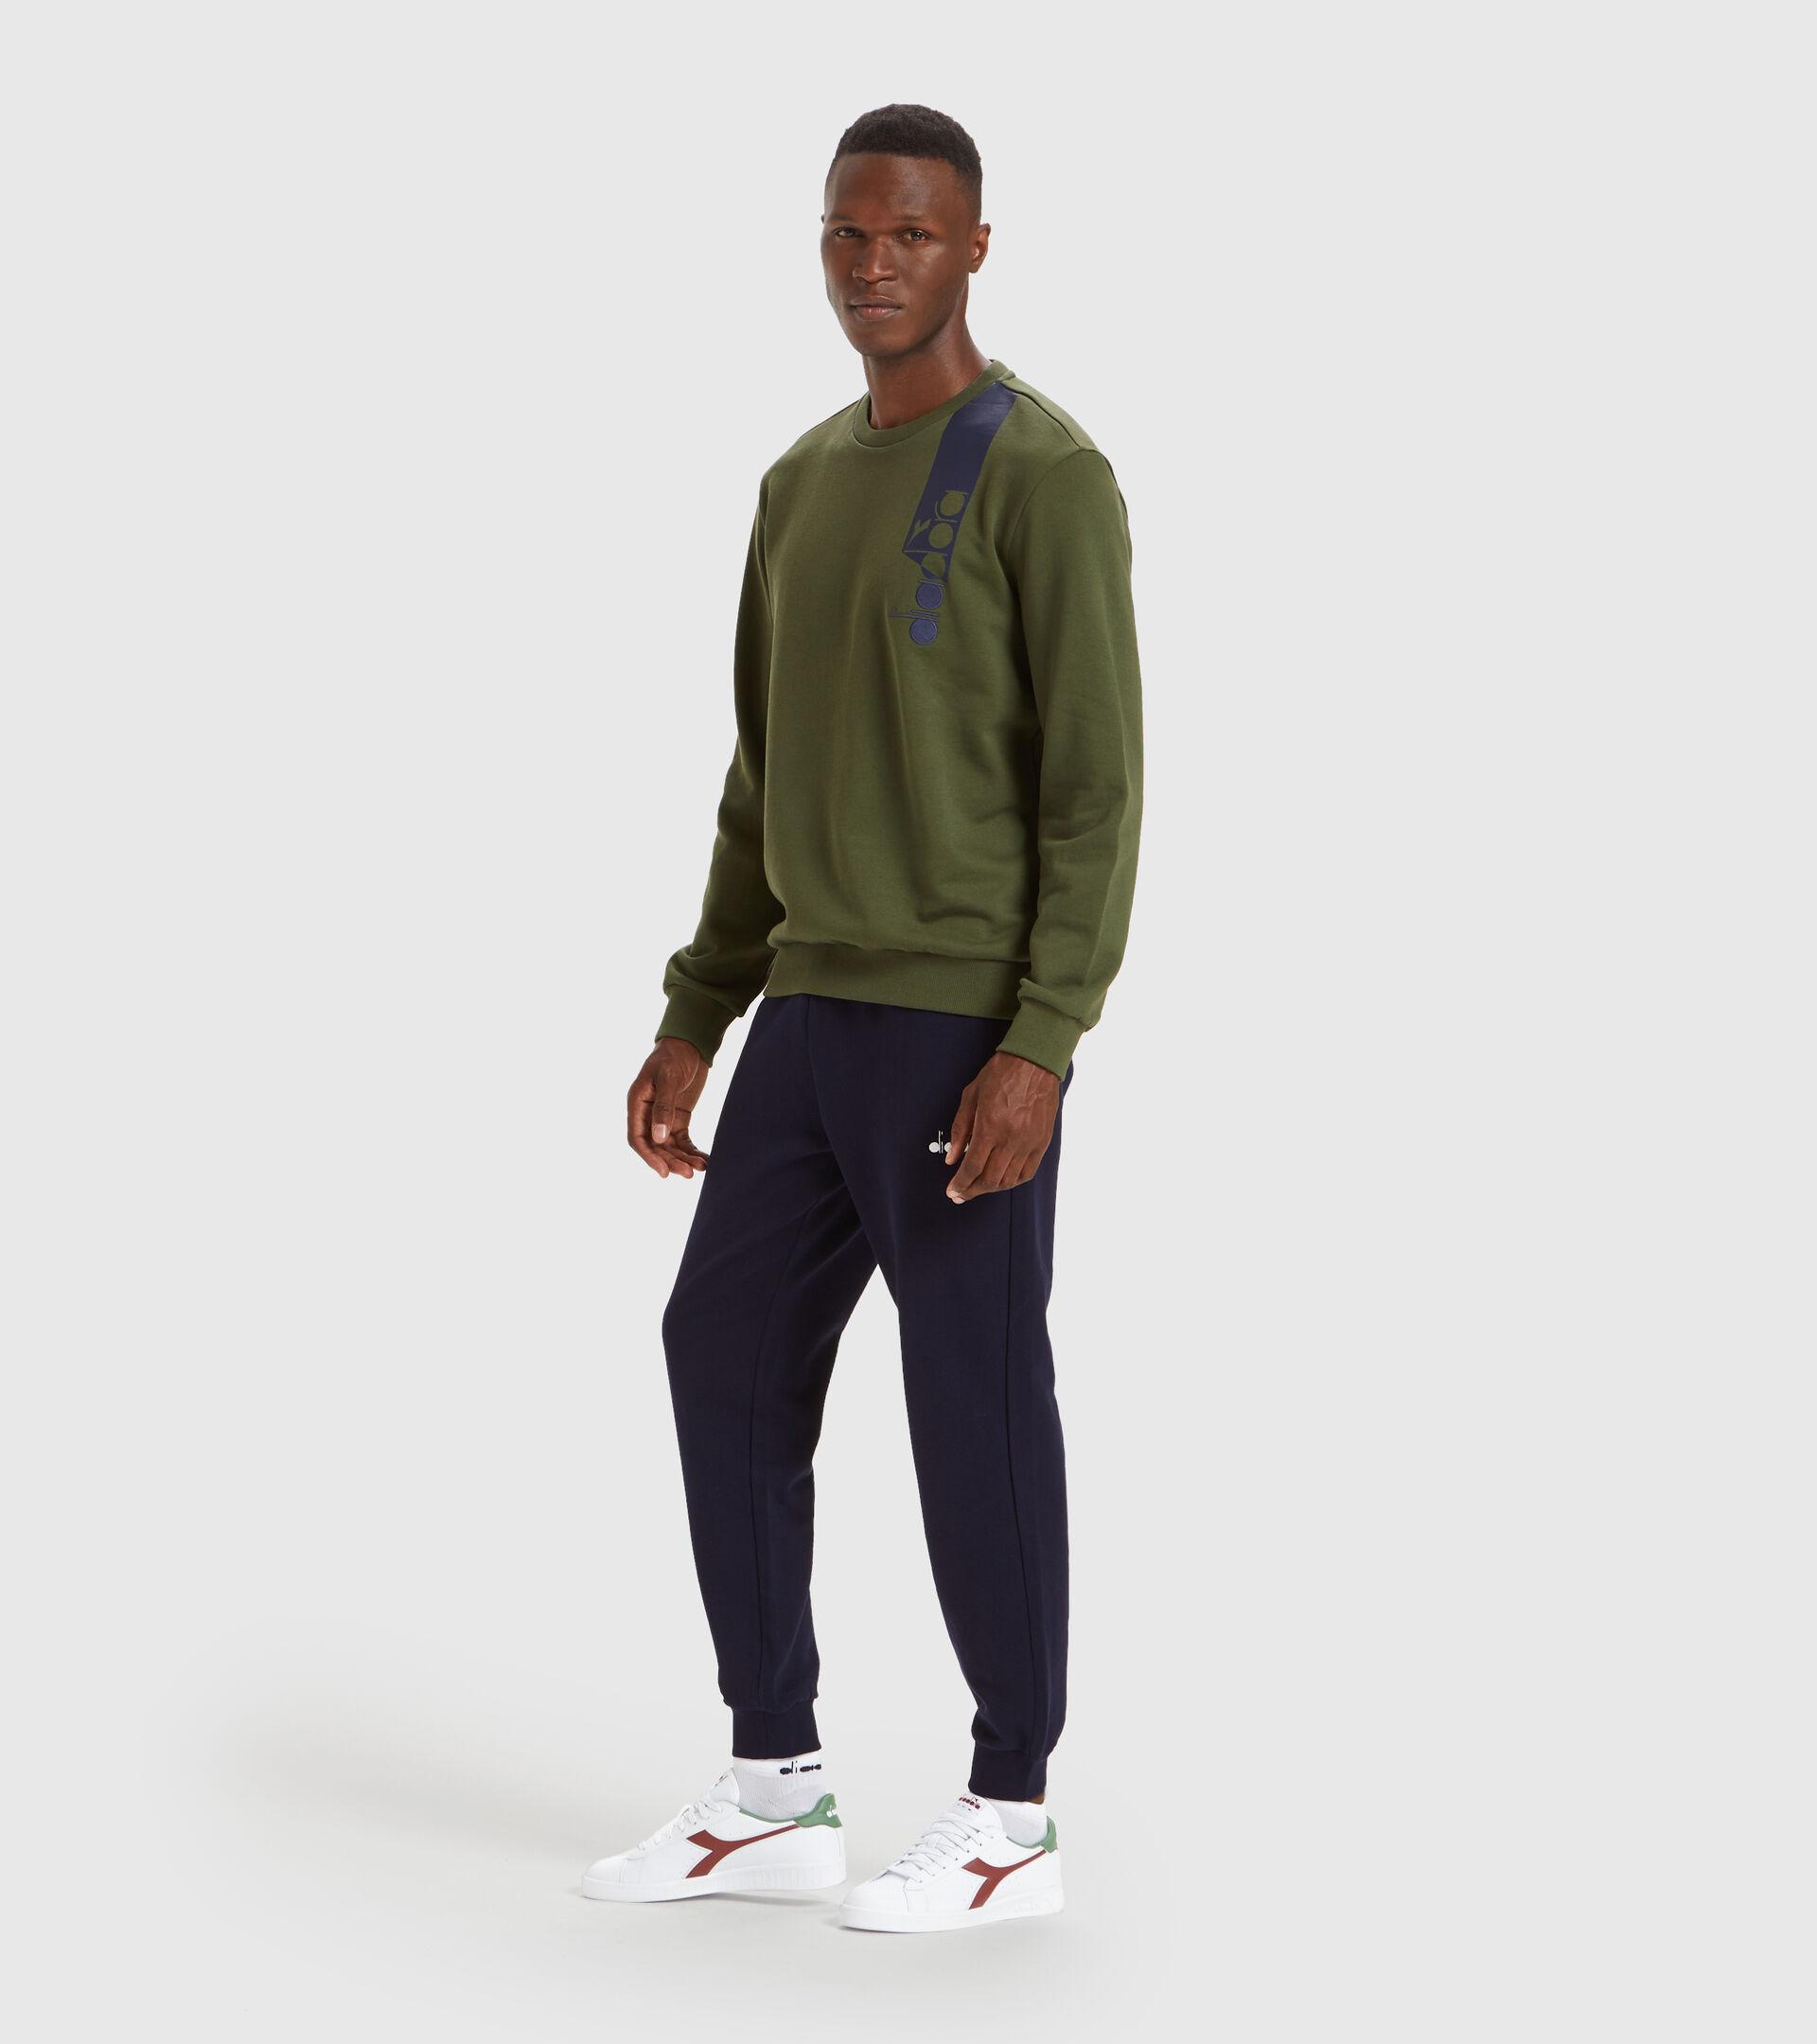 Apparel Sportswear UOMO PANT ICON BLU CLASSICO Diadora